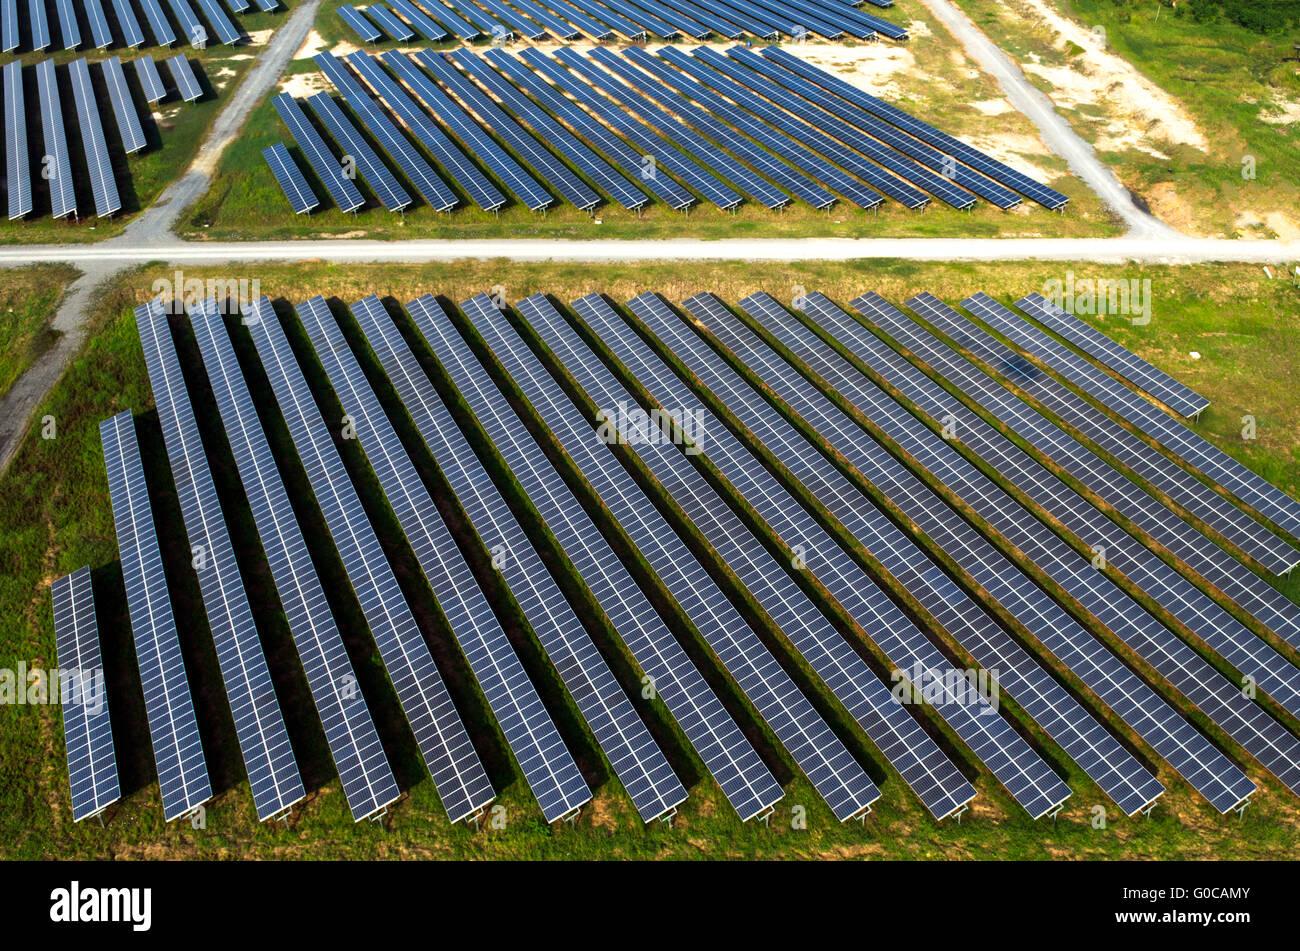 Solar farm, solar panels aerial view - Stock Image